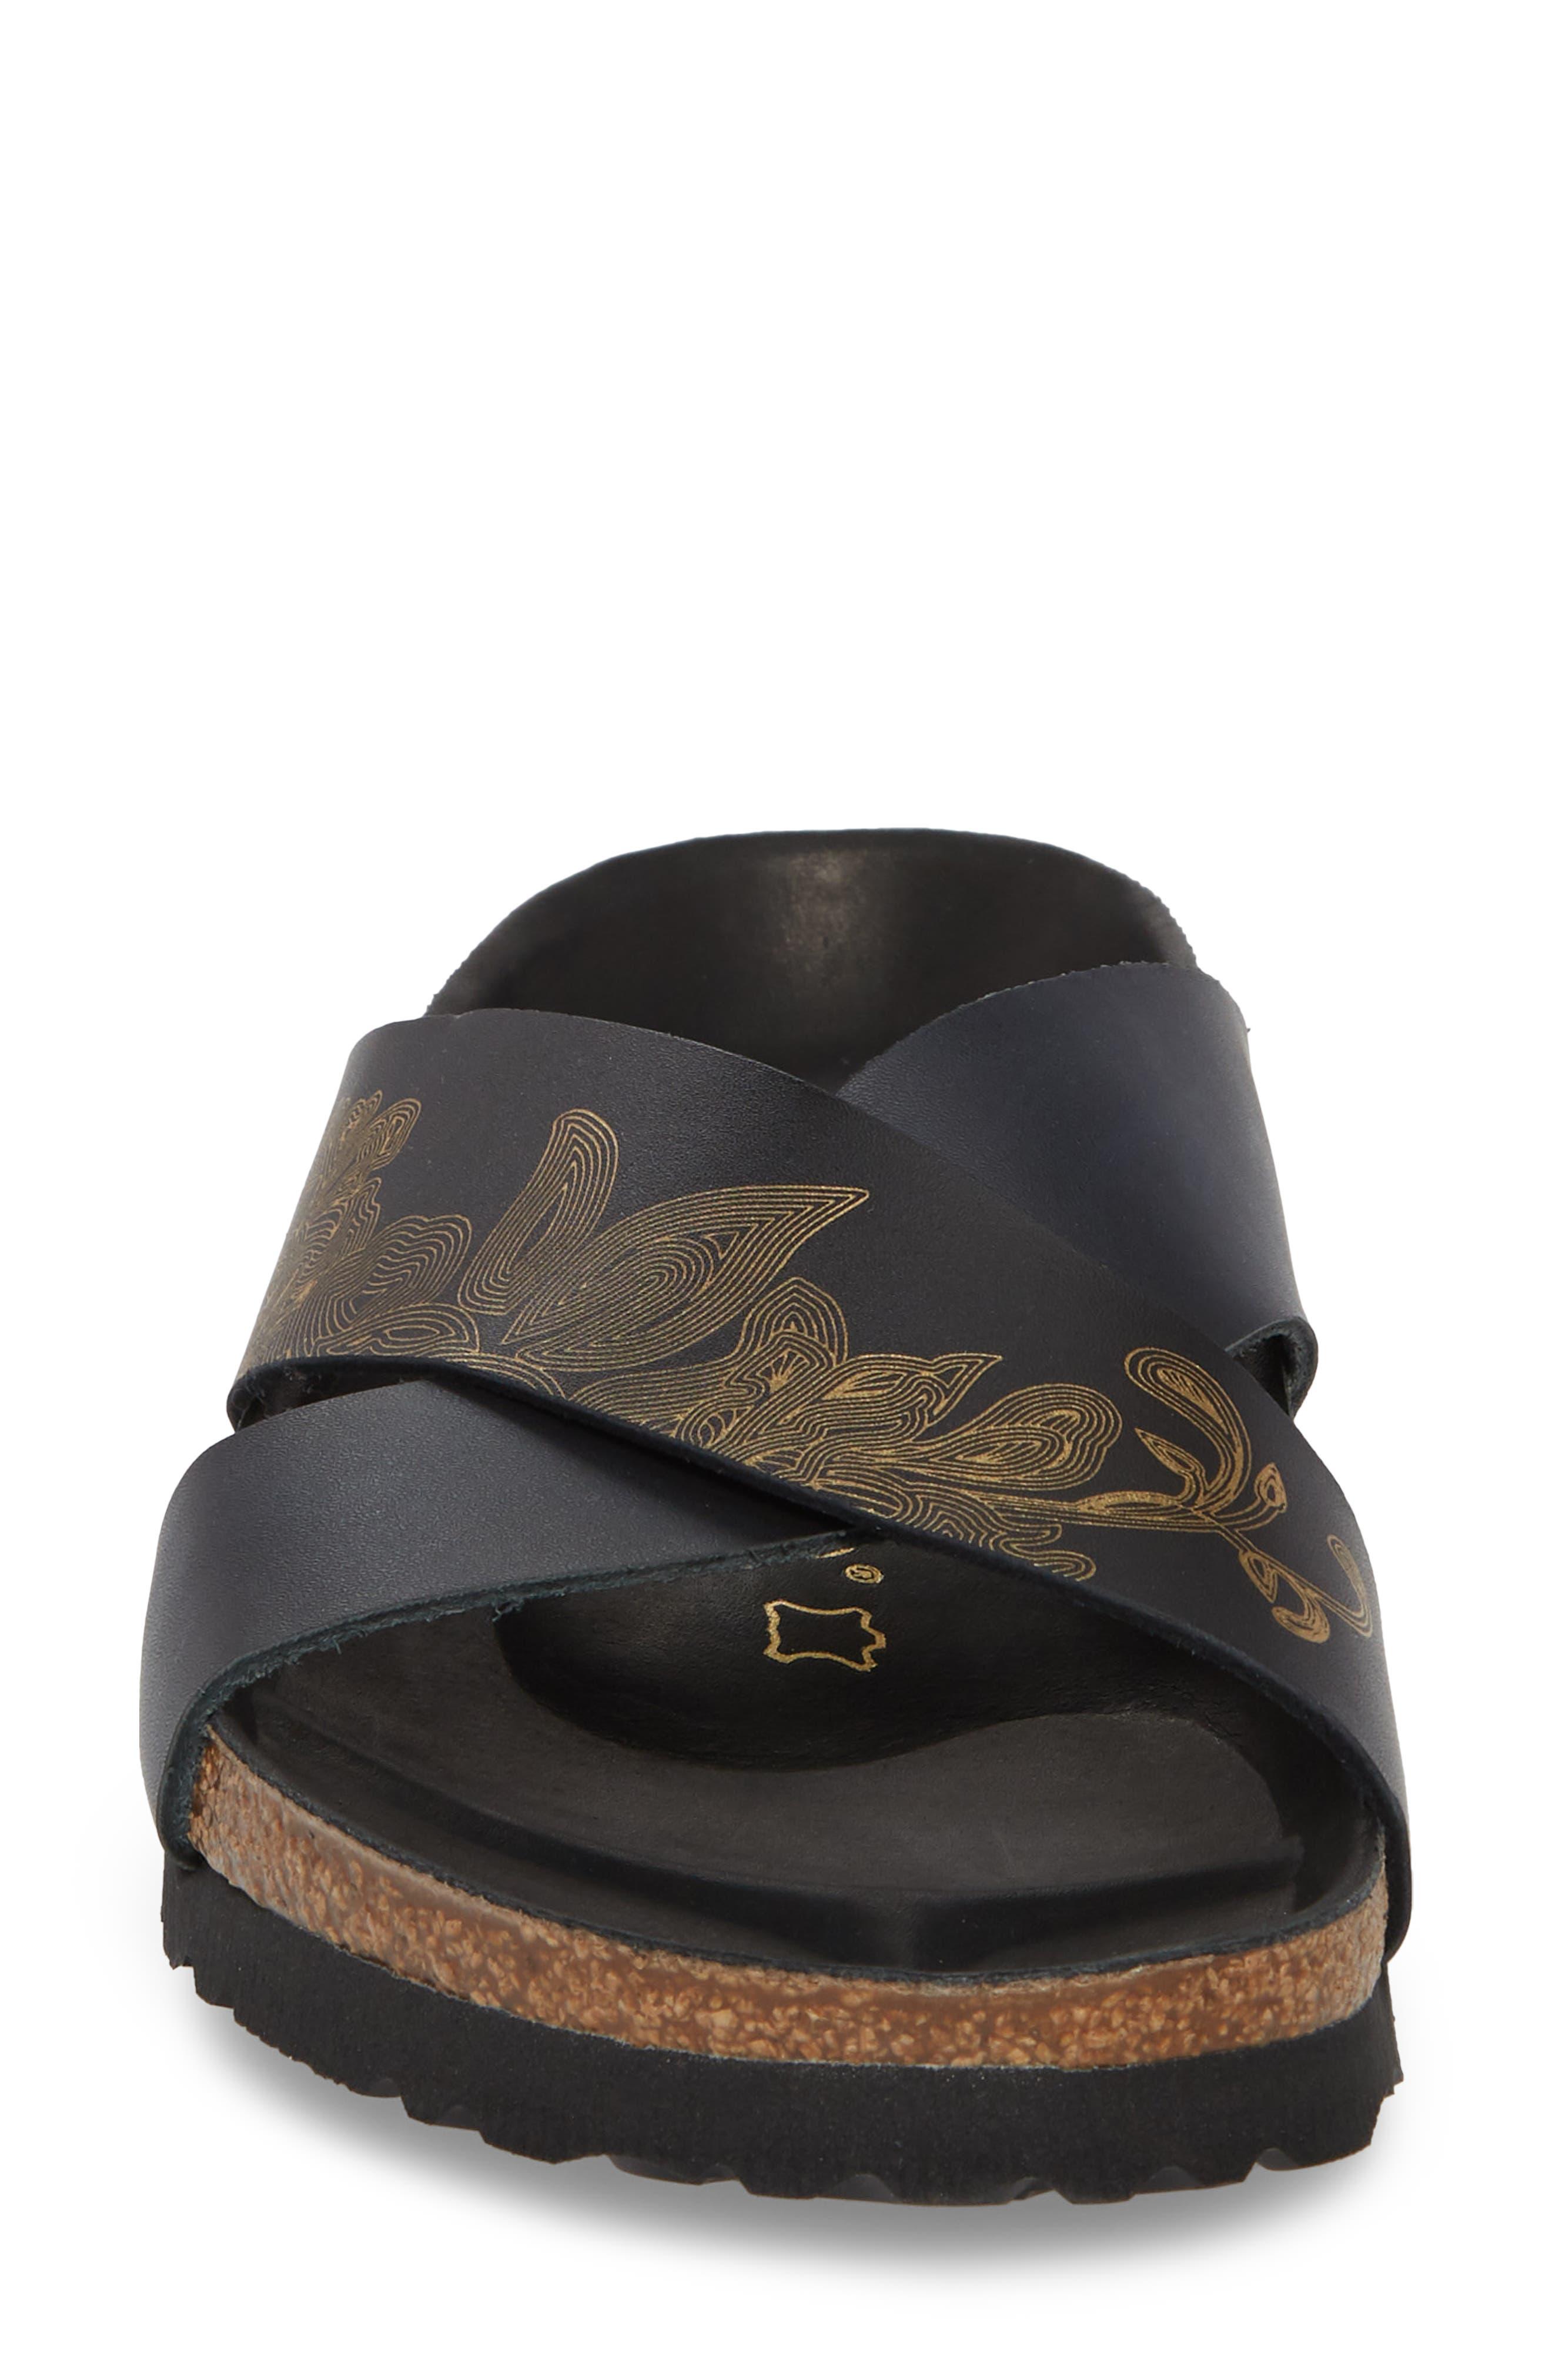 Papillio by Birkenstock Daytona Hex Slide Sandal,                             Alternate thumbnail 4, color,                             Ornaments Black Leather